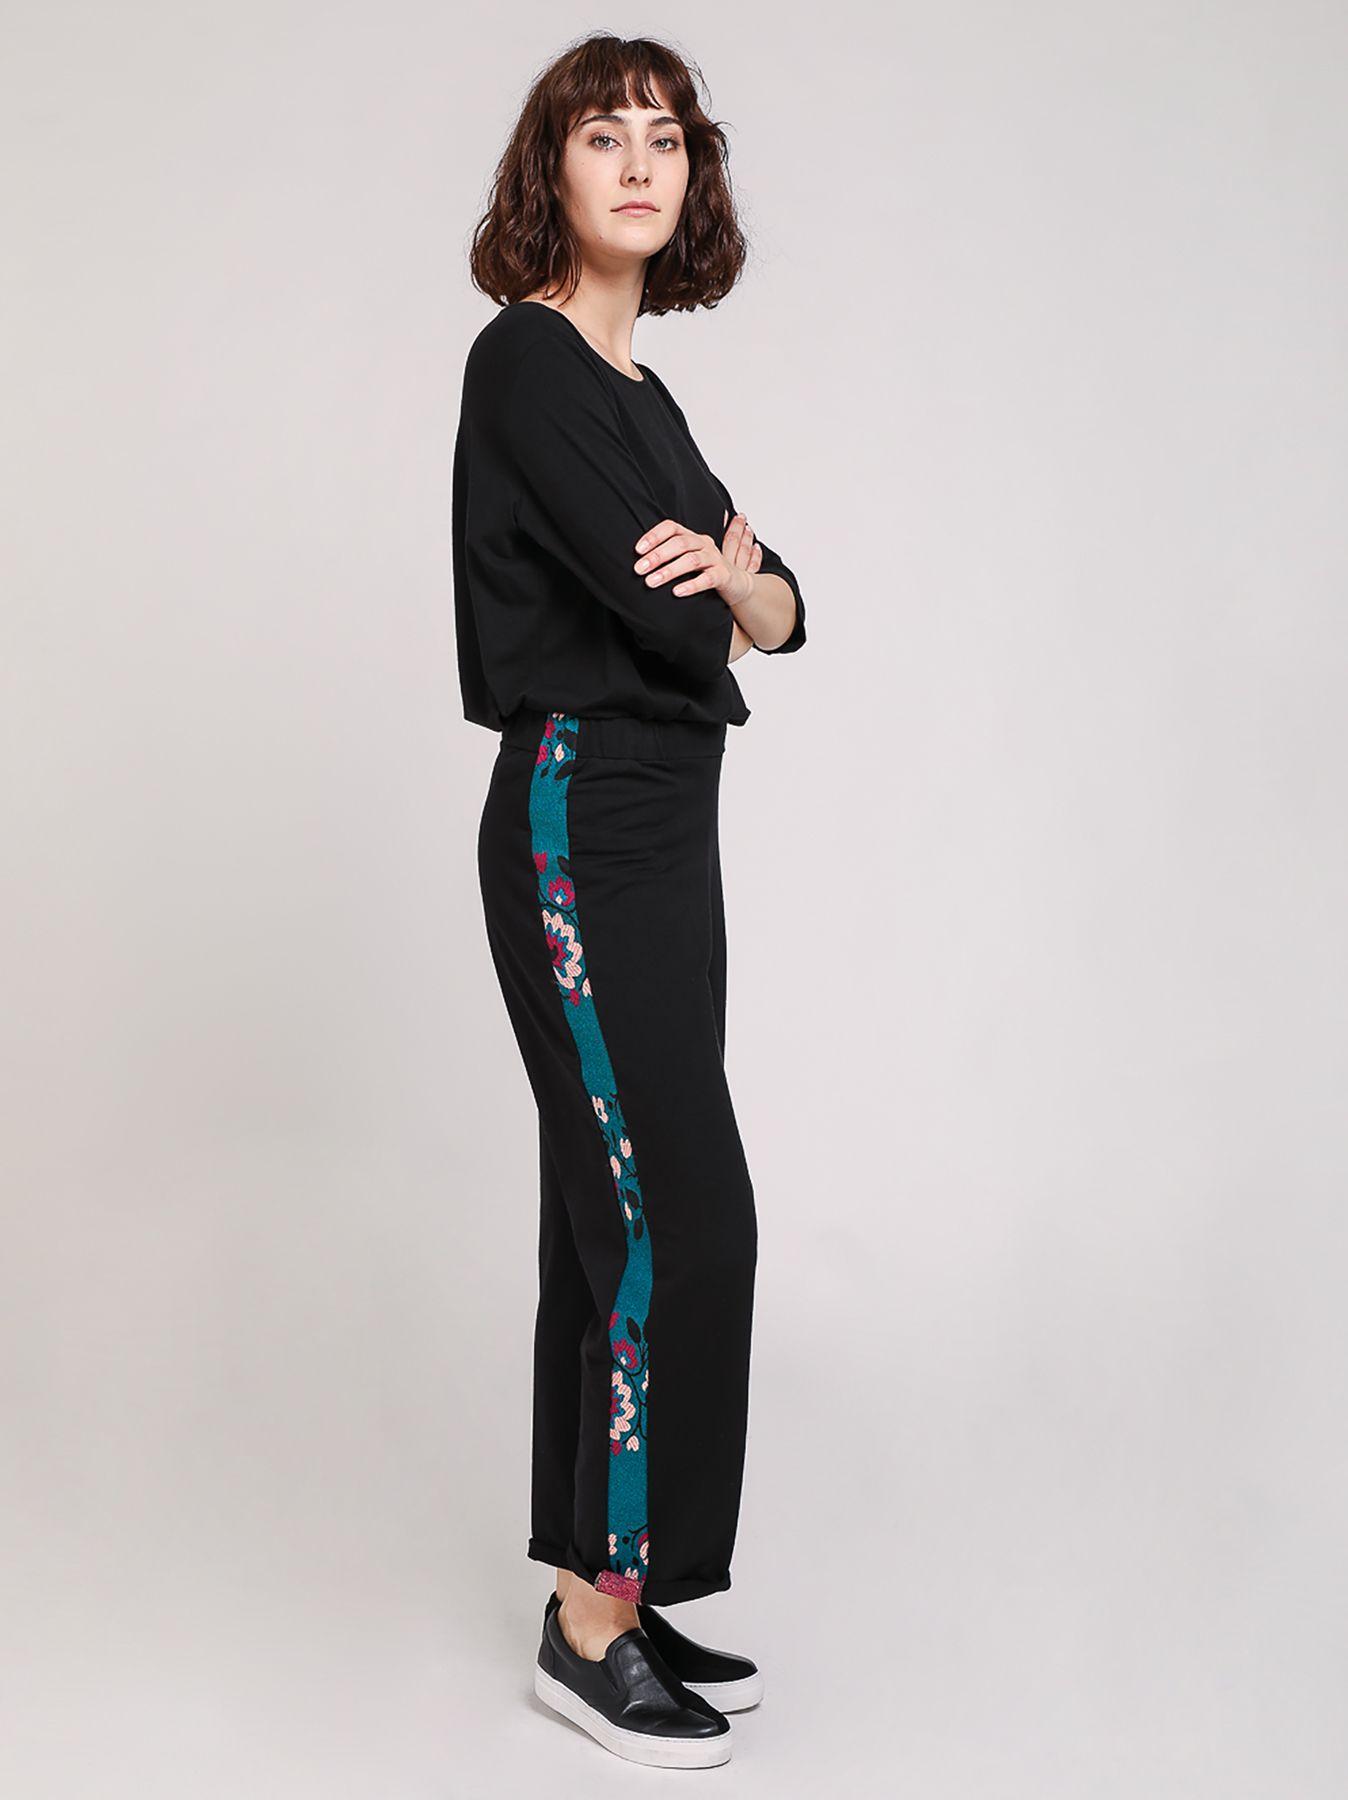 Pantalone in felpa con banda floreale